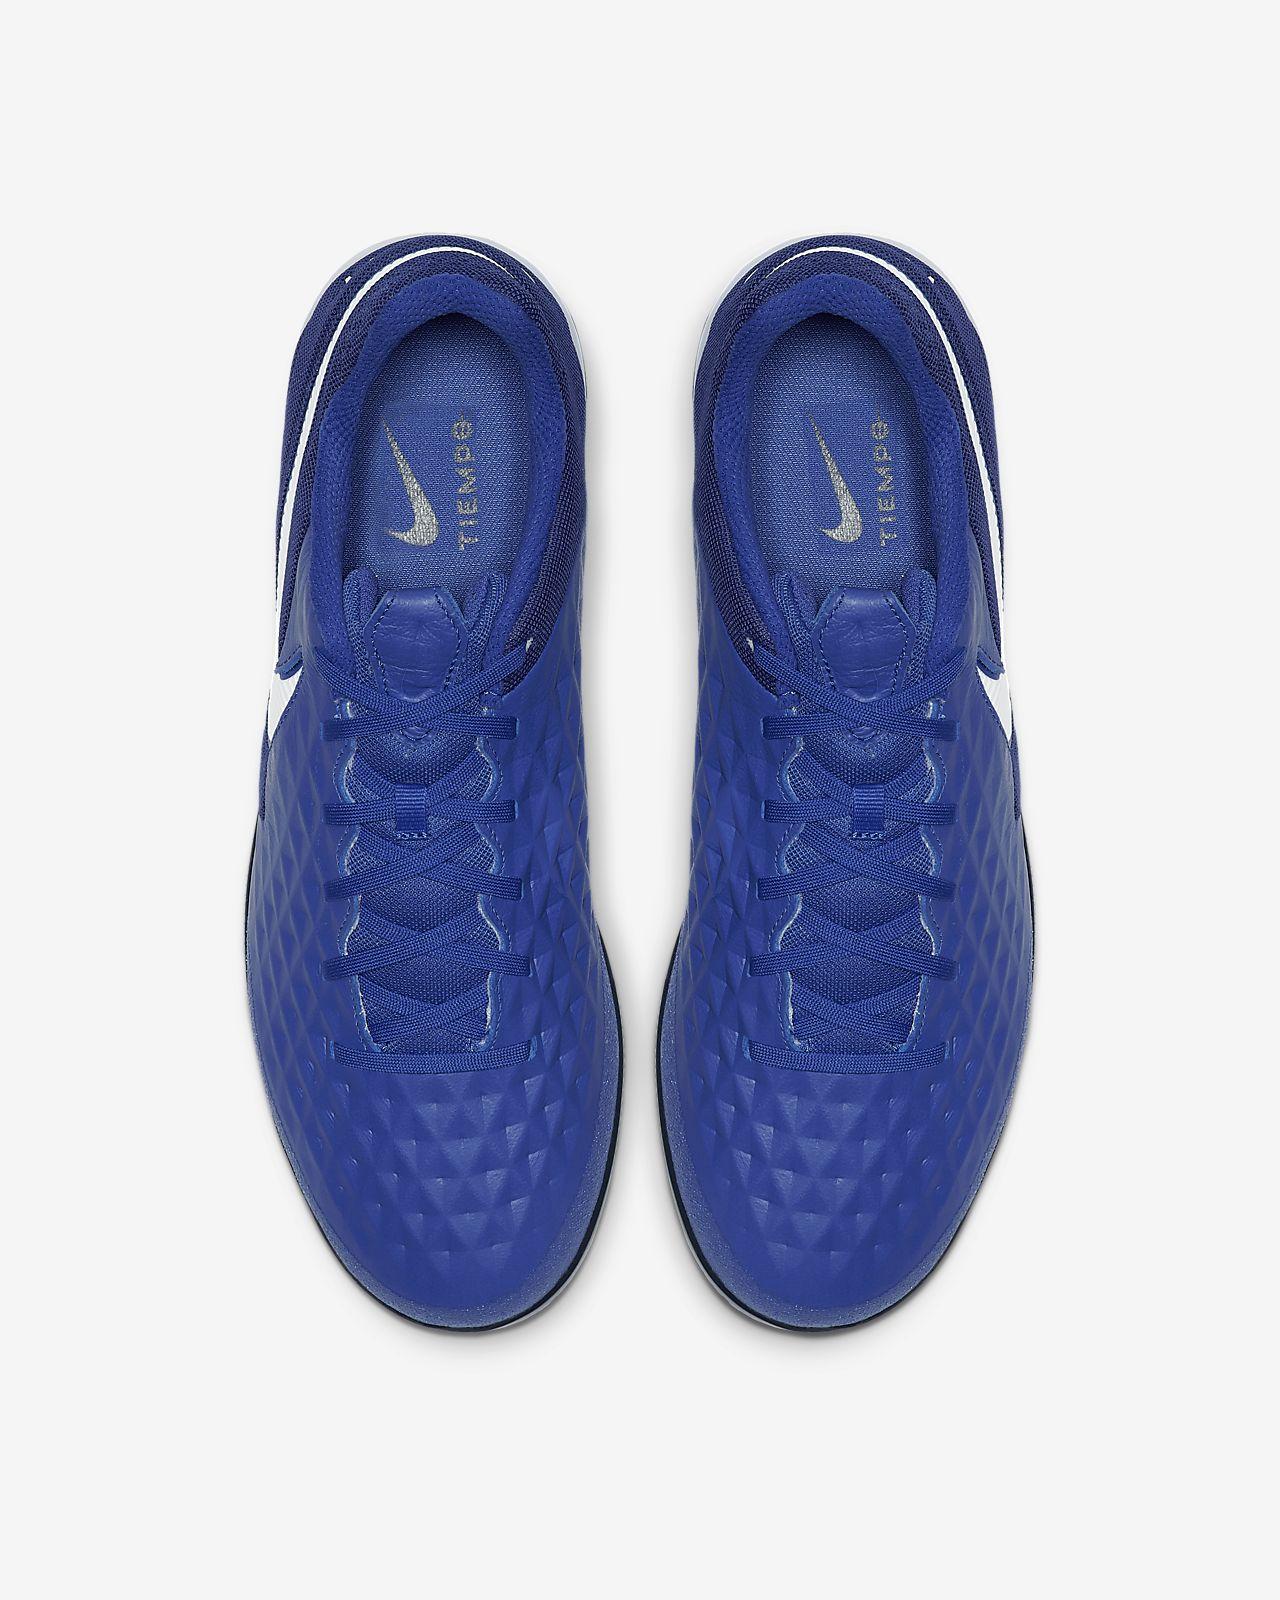 0f6a1ba131b77 Nike React Tiempo Legend 8 Pro IC Indoor/Court Football Shoe. Nike ...